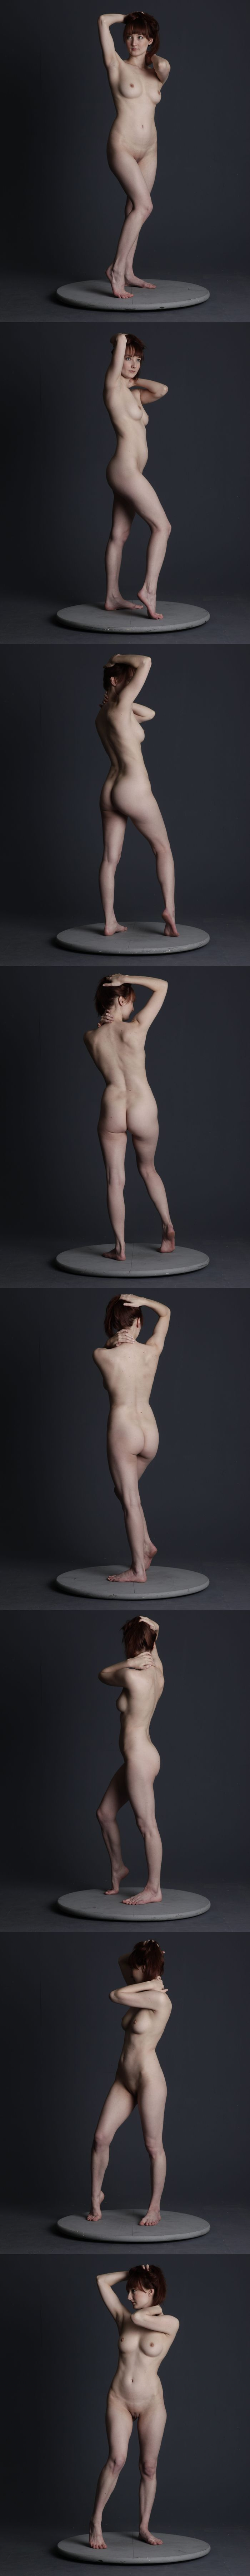 Nude figure drawing pose reference turn-around by http://mjranum-stock.deviantart.com